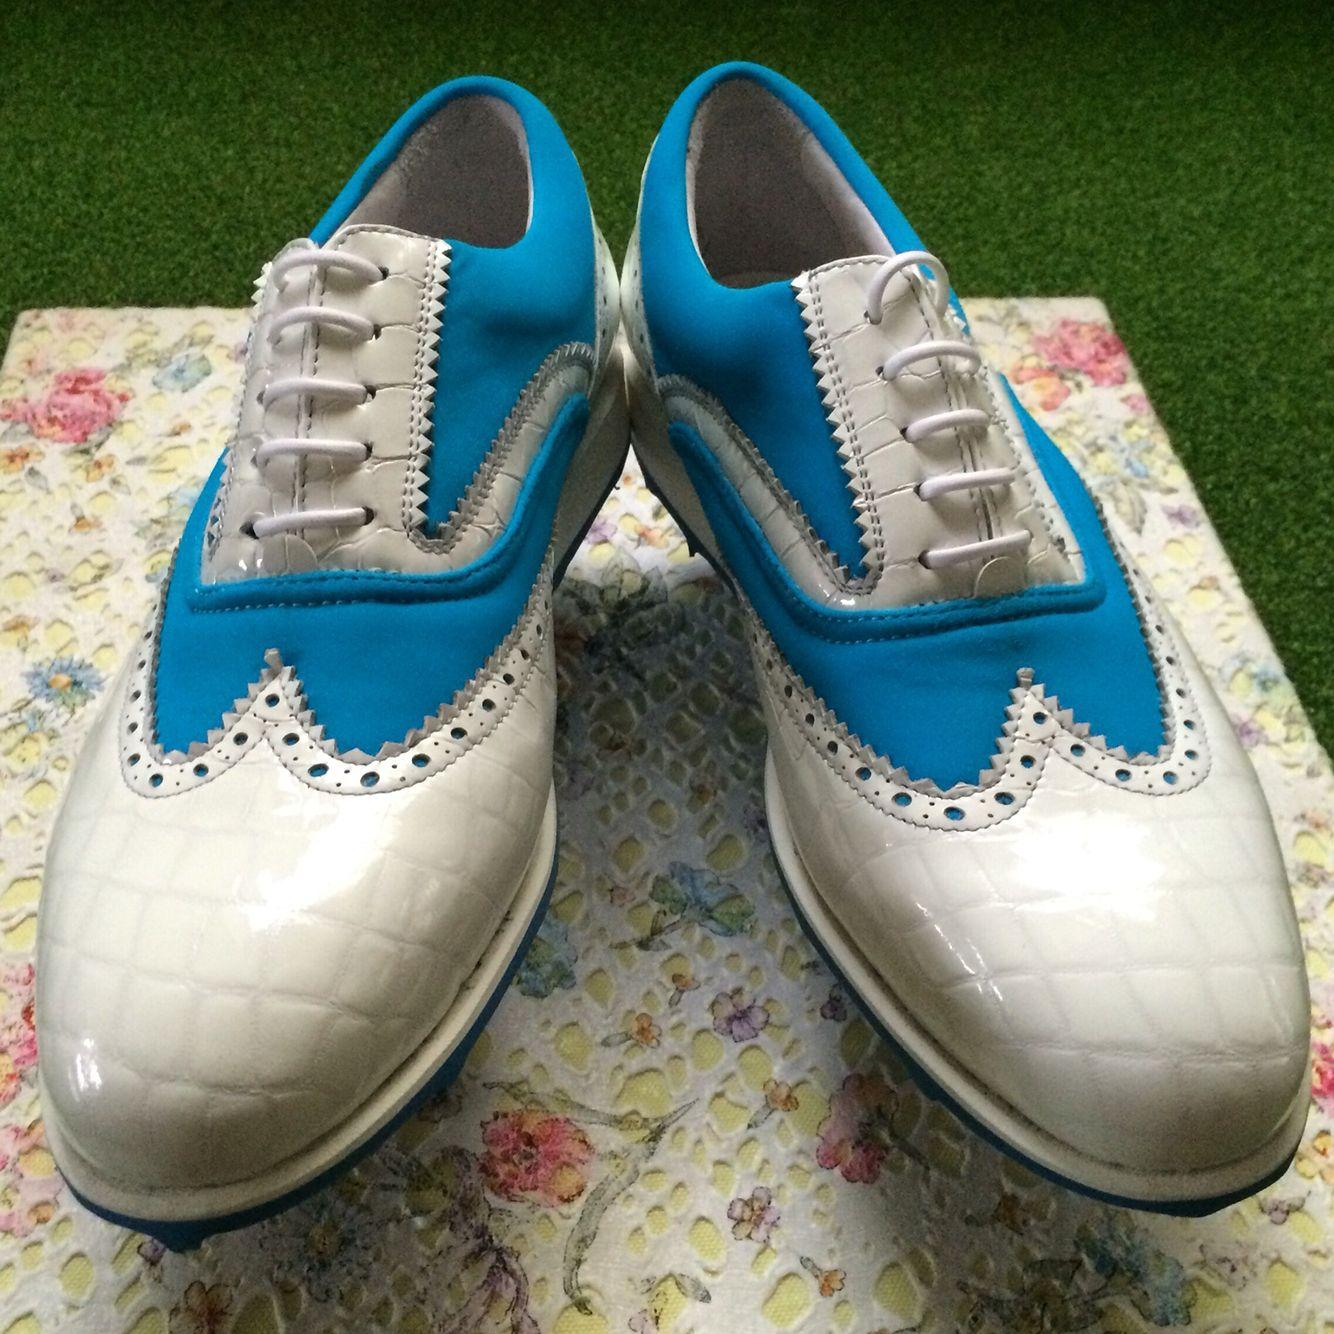 #Raimondi #raimondigolfshoes #golf #shoes #golfshoes #italianstyle #handmadeinitaly #italy #originali #madeinitaly